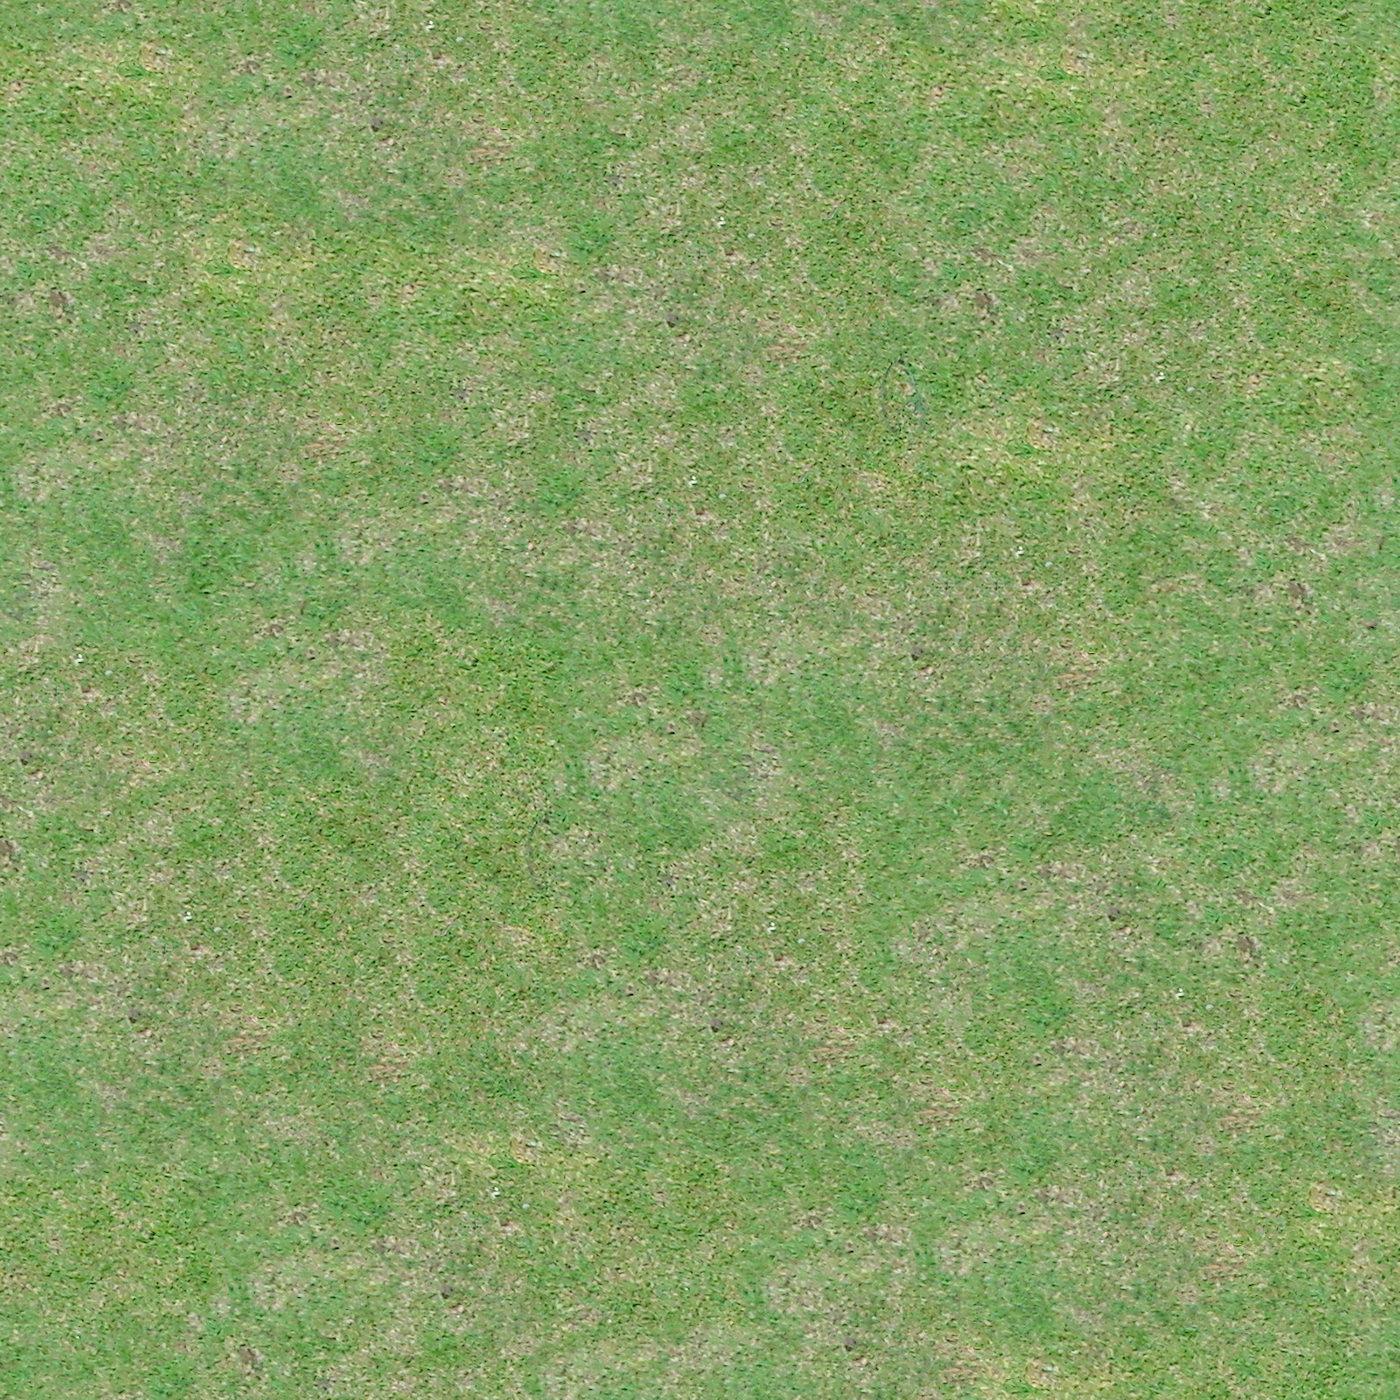 Swtexture Free Architectural Textures Seamless Grass